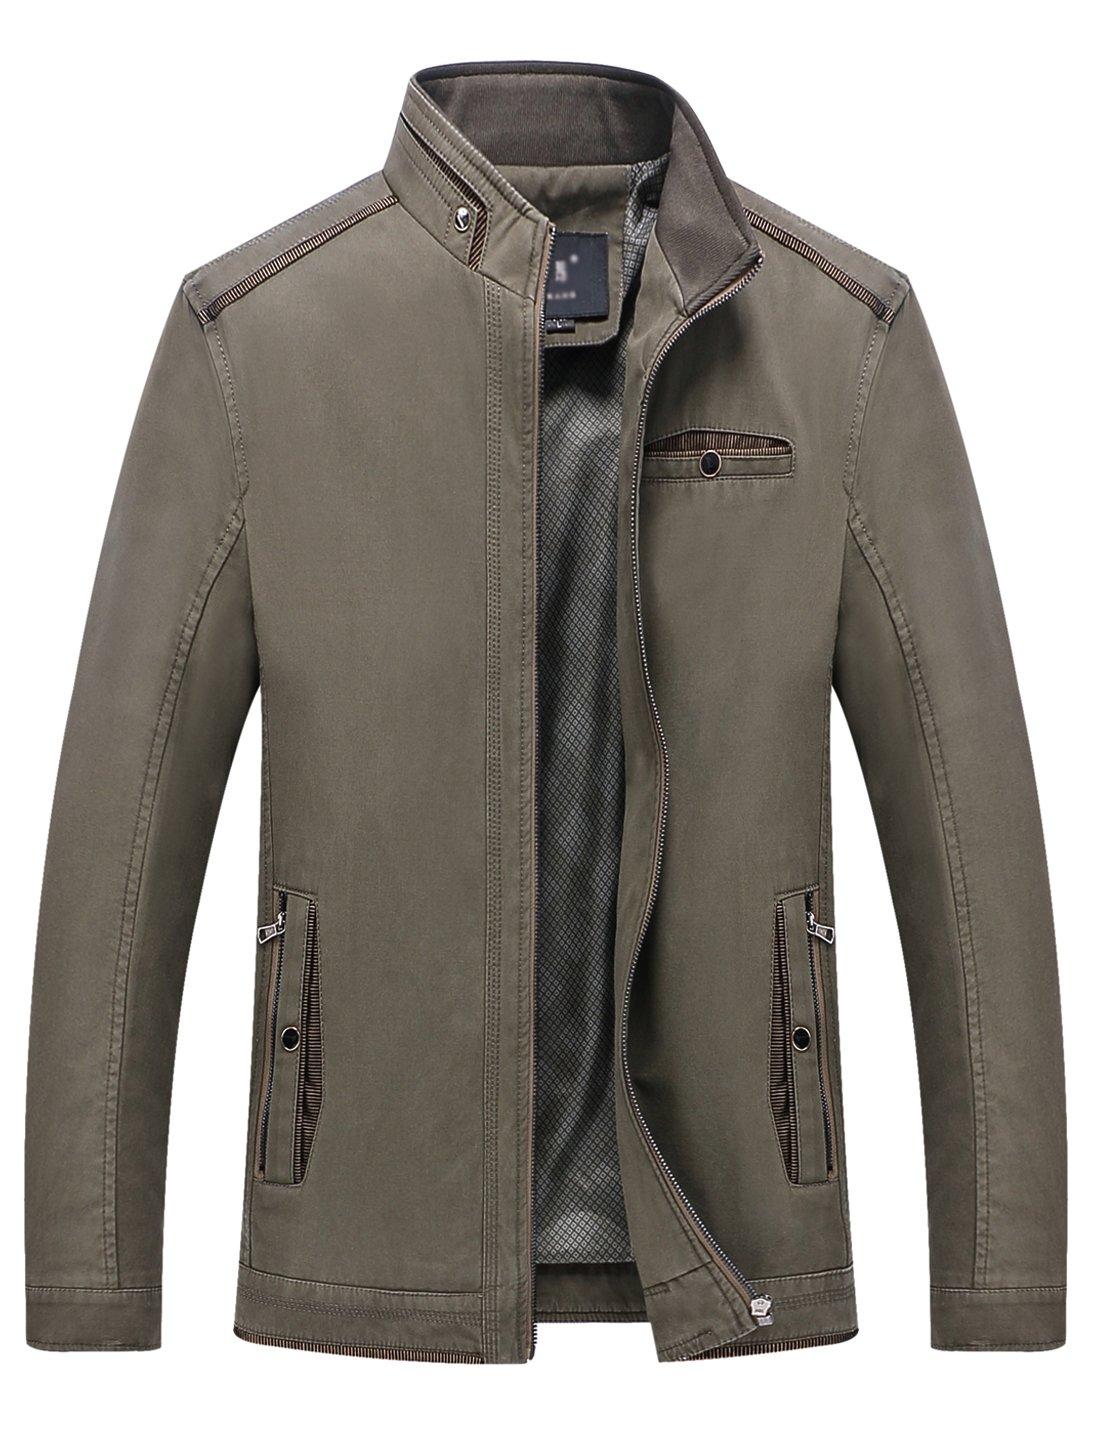 Springrain Men's Casual Slim Fit Stand Collar Cotton Jackets (XX-Large, Dark Khaki)